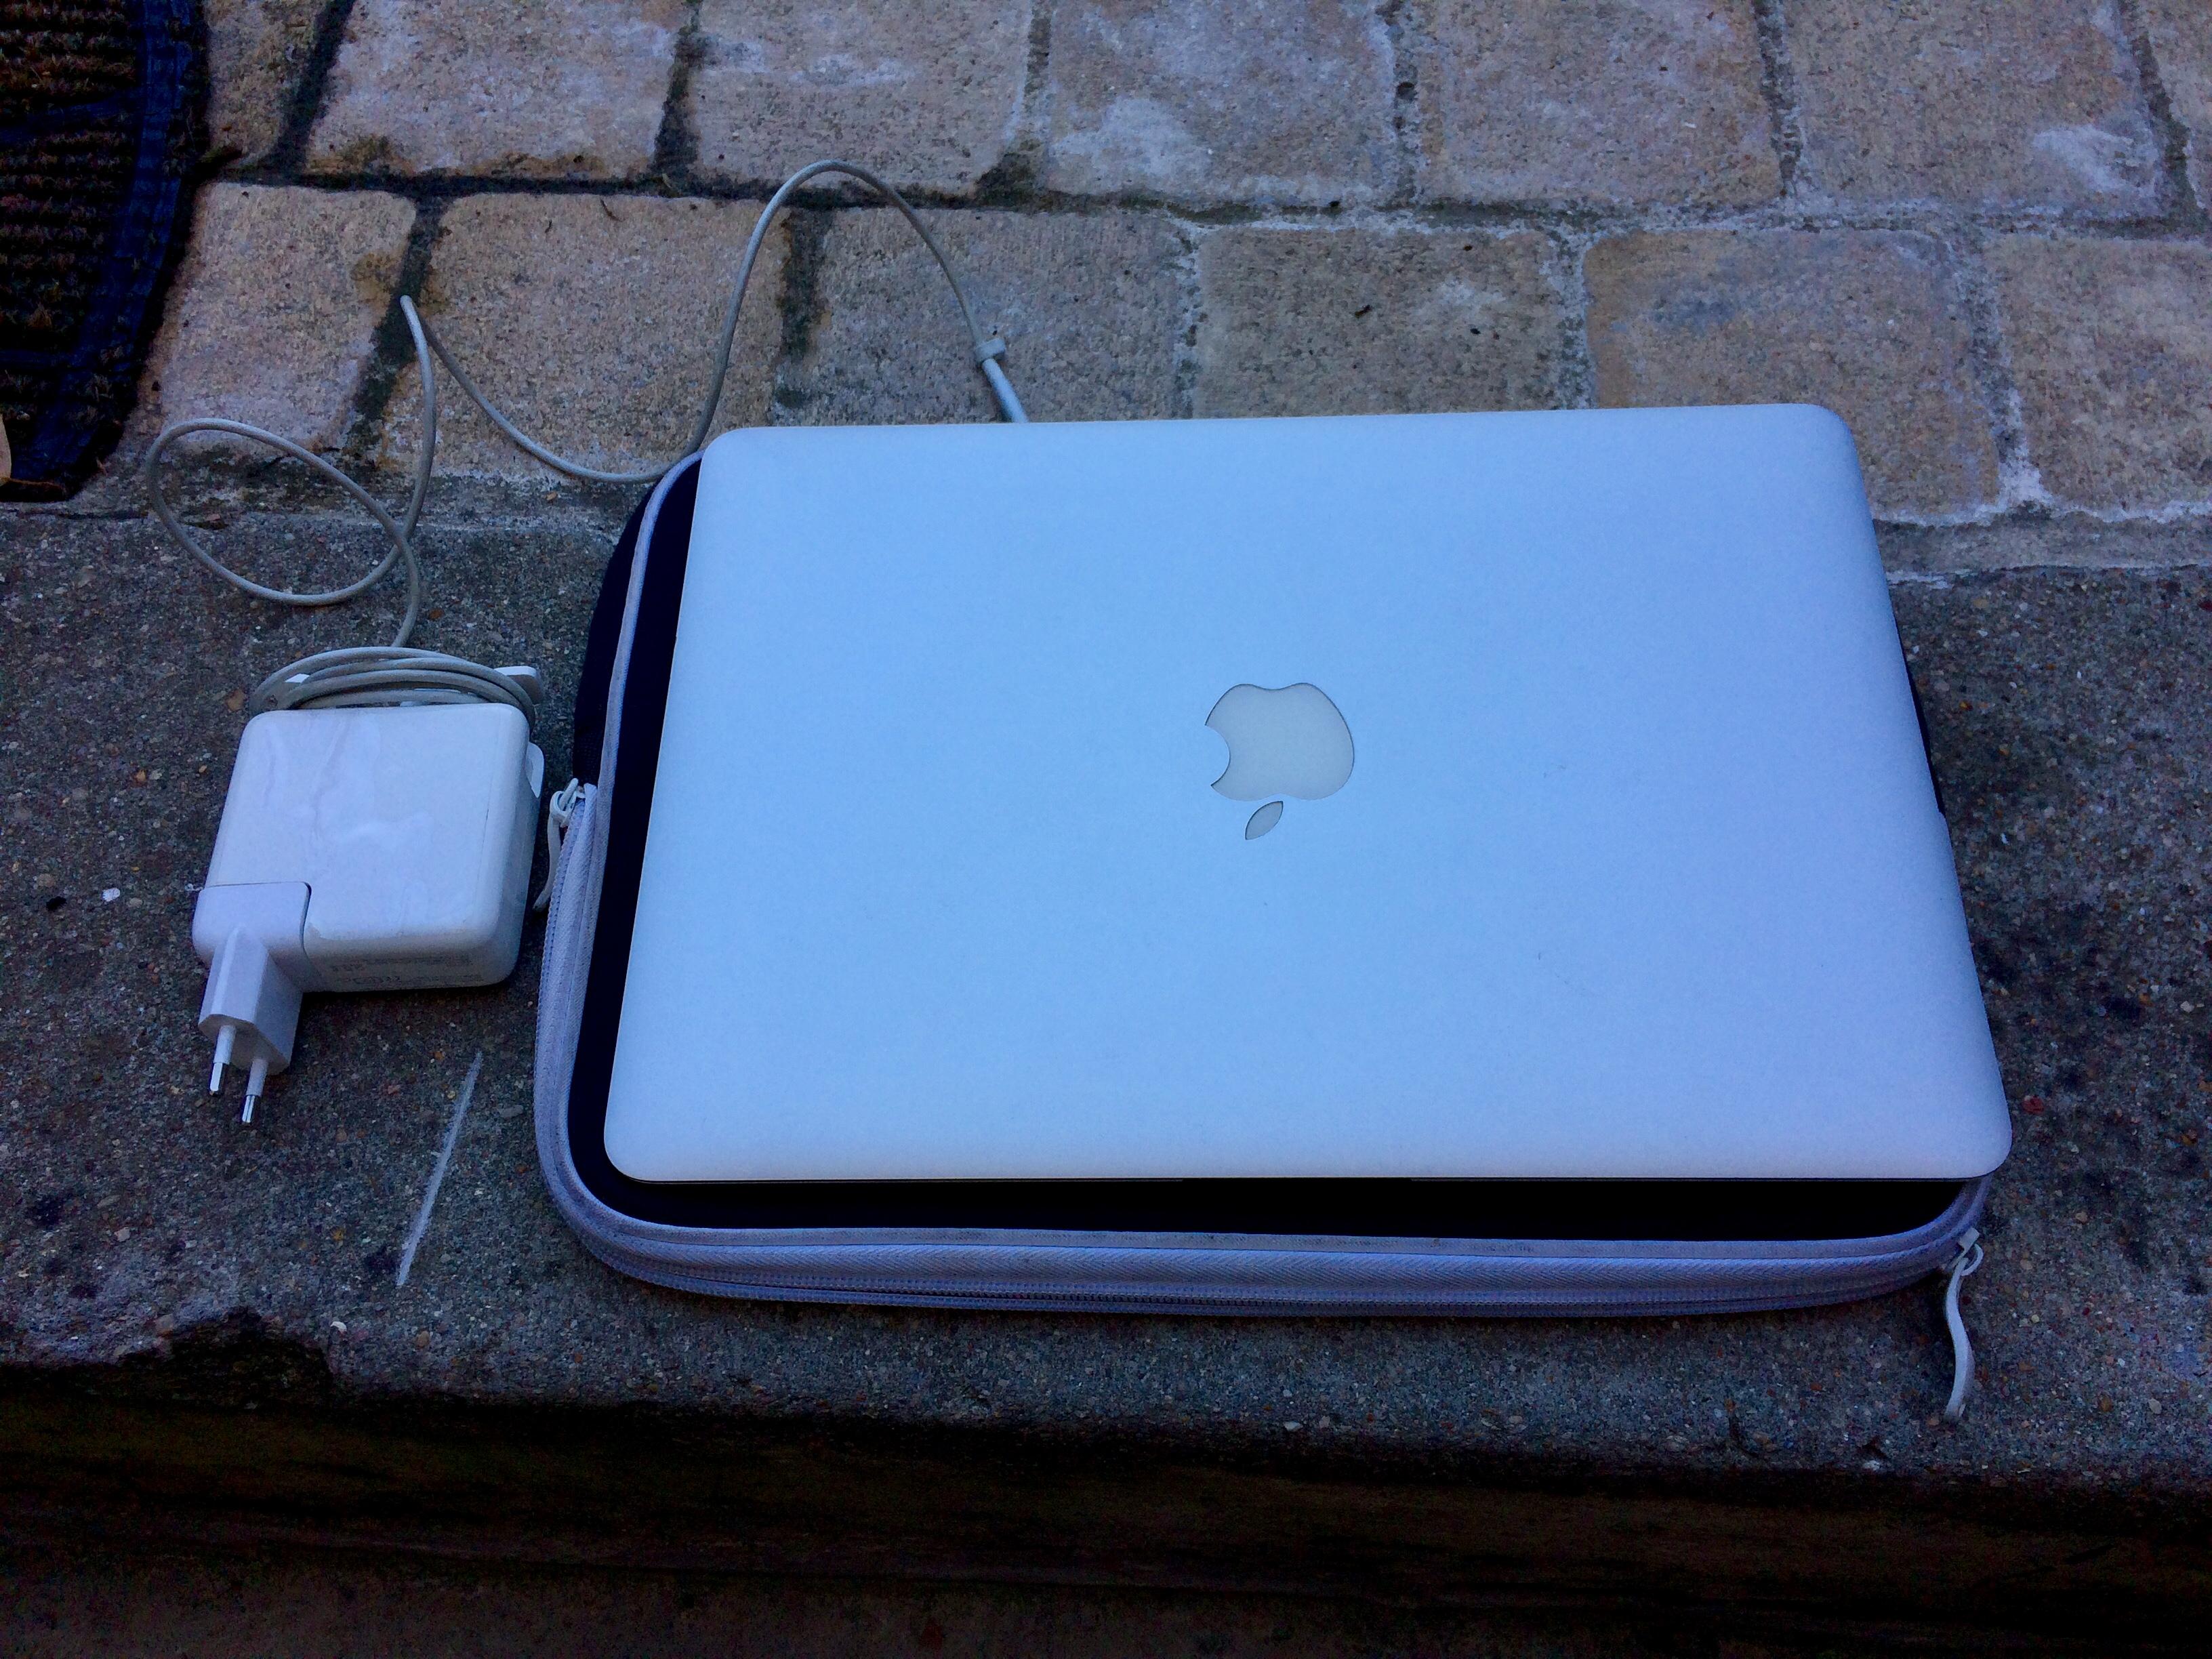 Vend Apple Macbook Air 13″ Fin 2010 SSD 128 Go